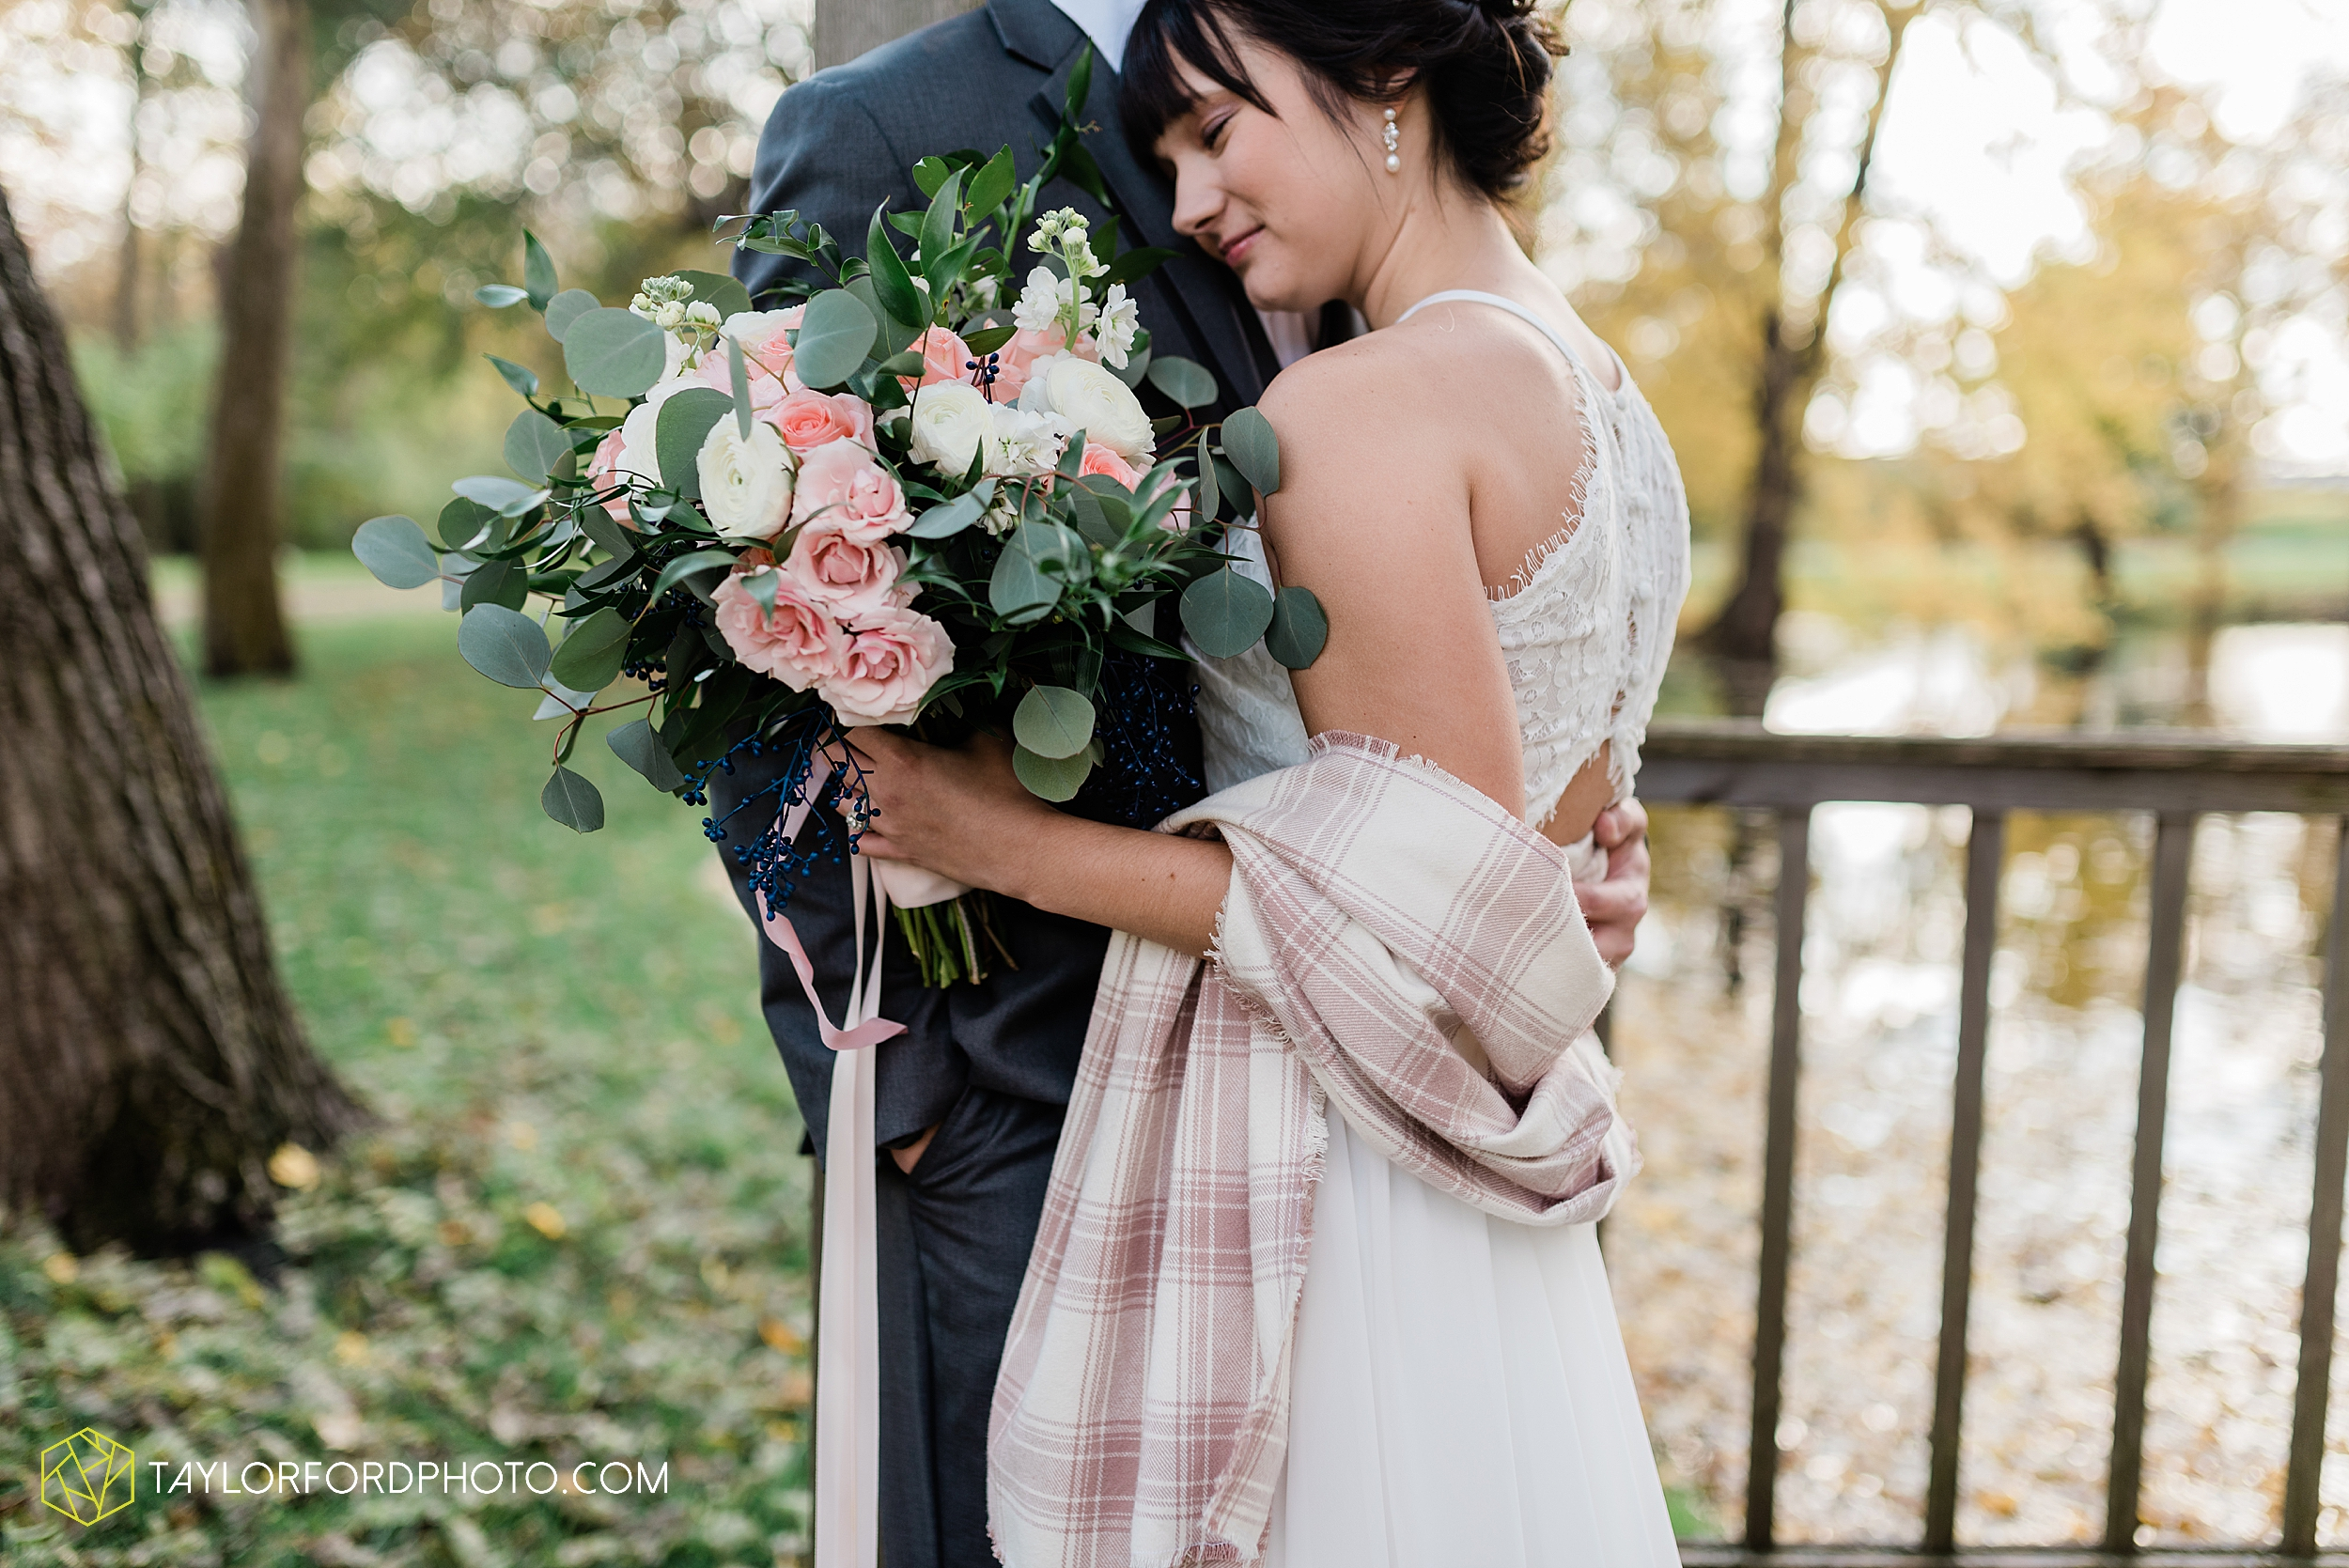 marissa-nicole-nick-daeger-orrmont-estate-farm-wedding-piqua-dayton-troy-ohio-fall-photographer-taylor-ford-photography_1513.jpg